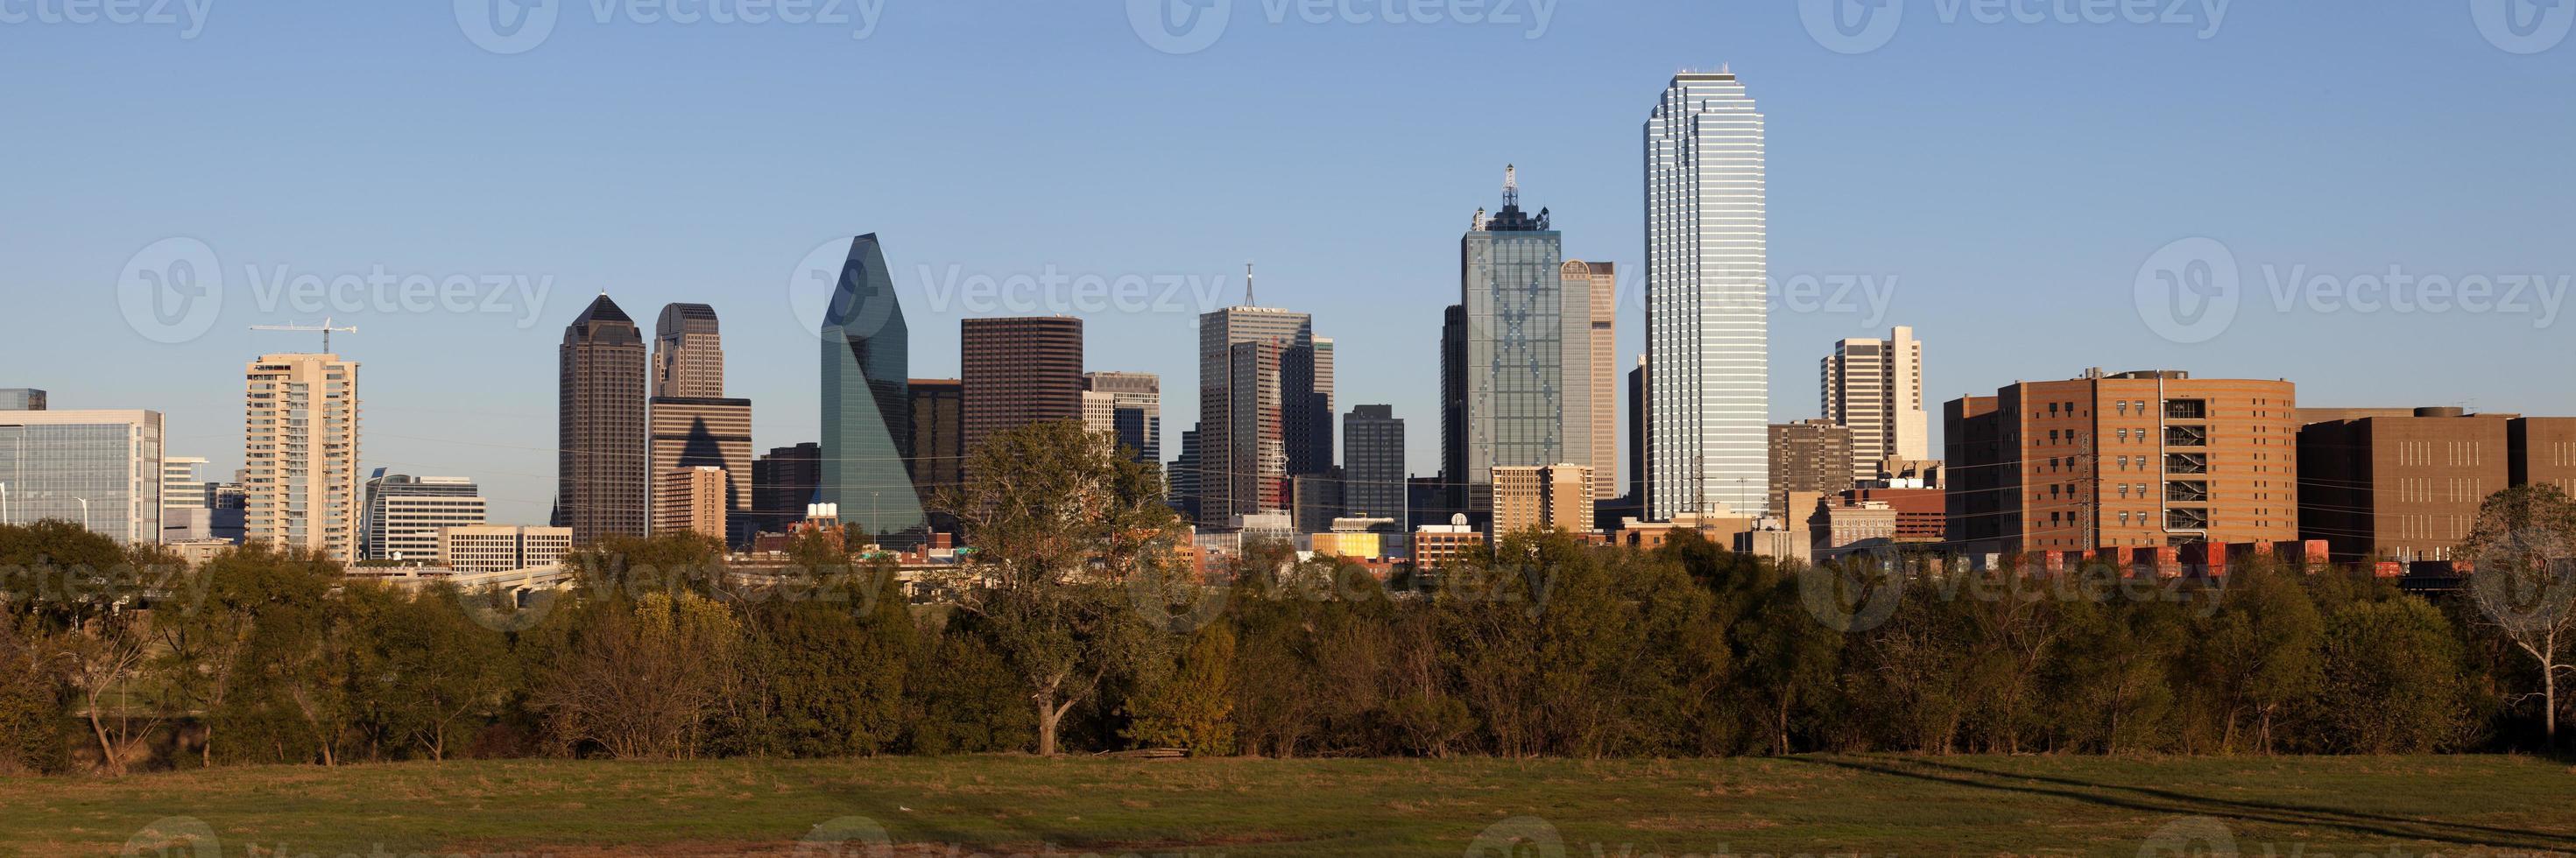 Dallas Texas Skyline foto